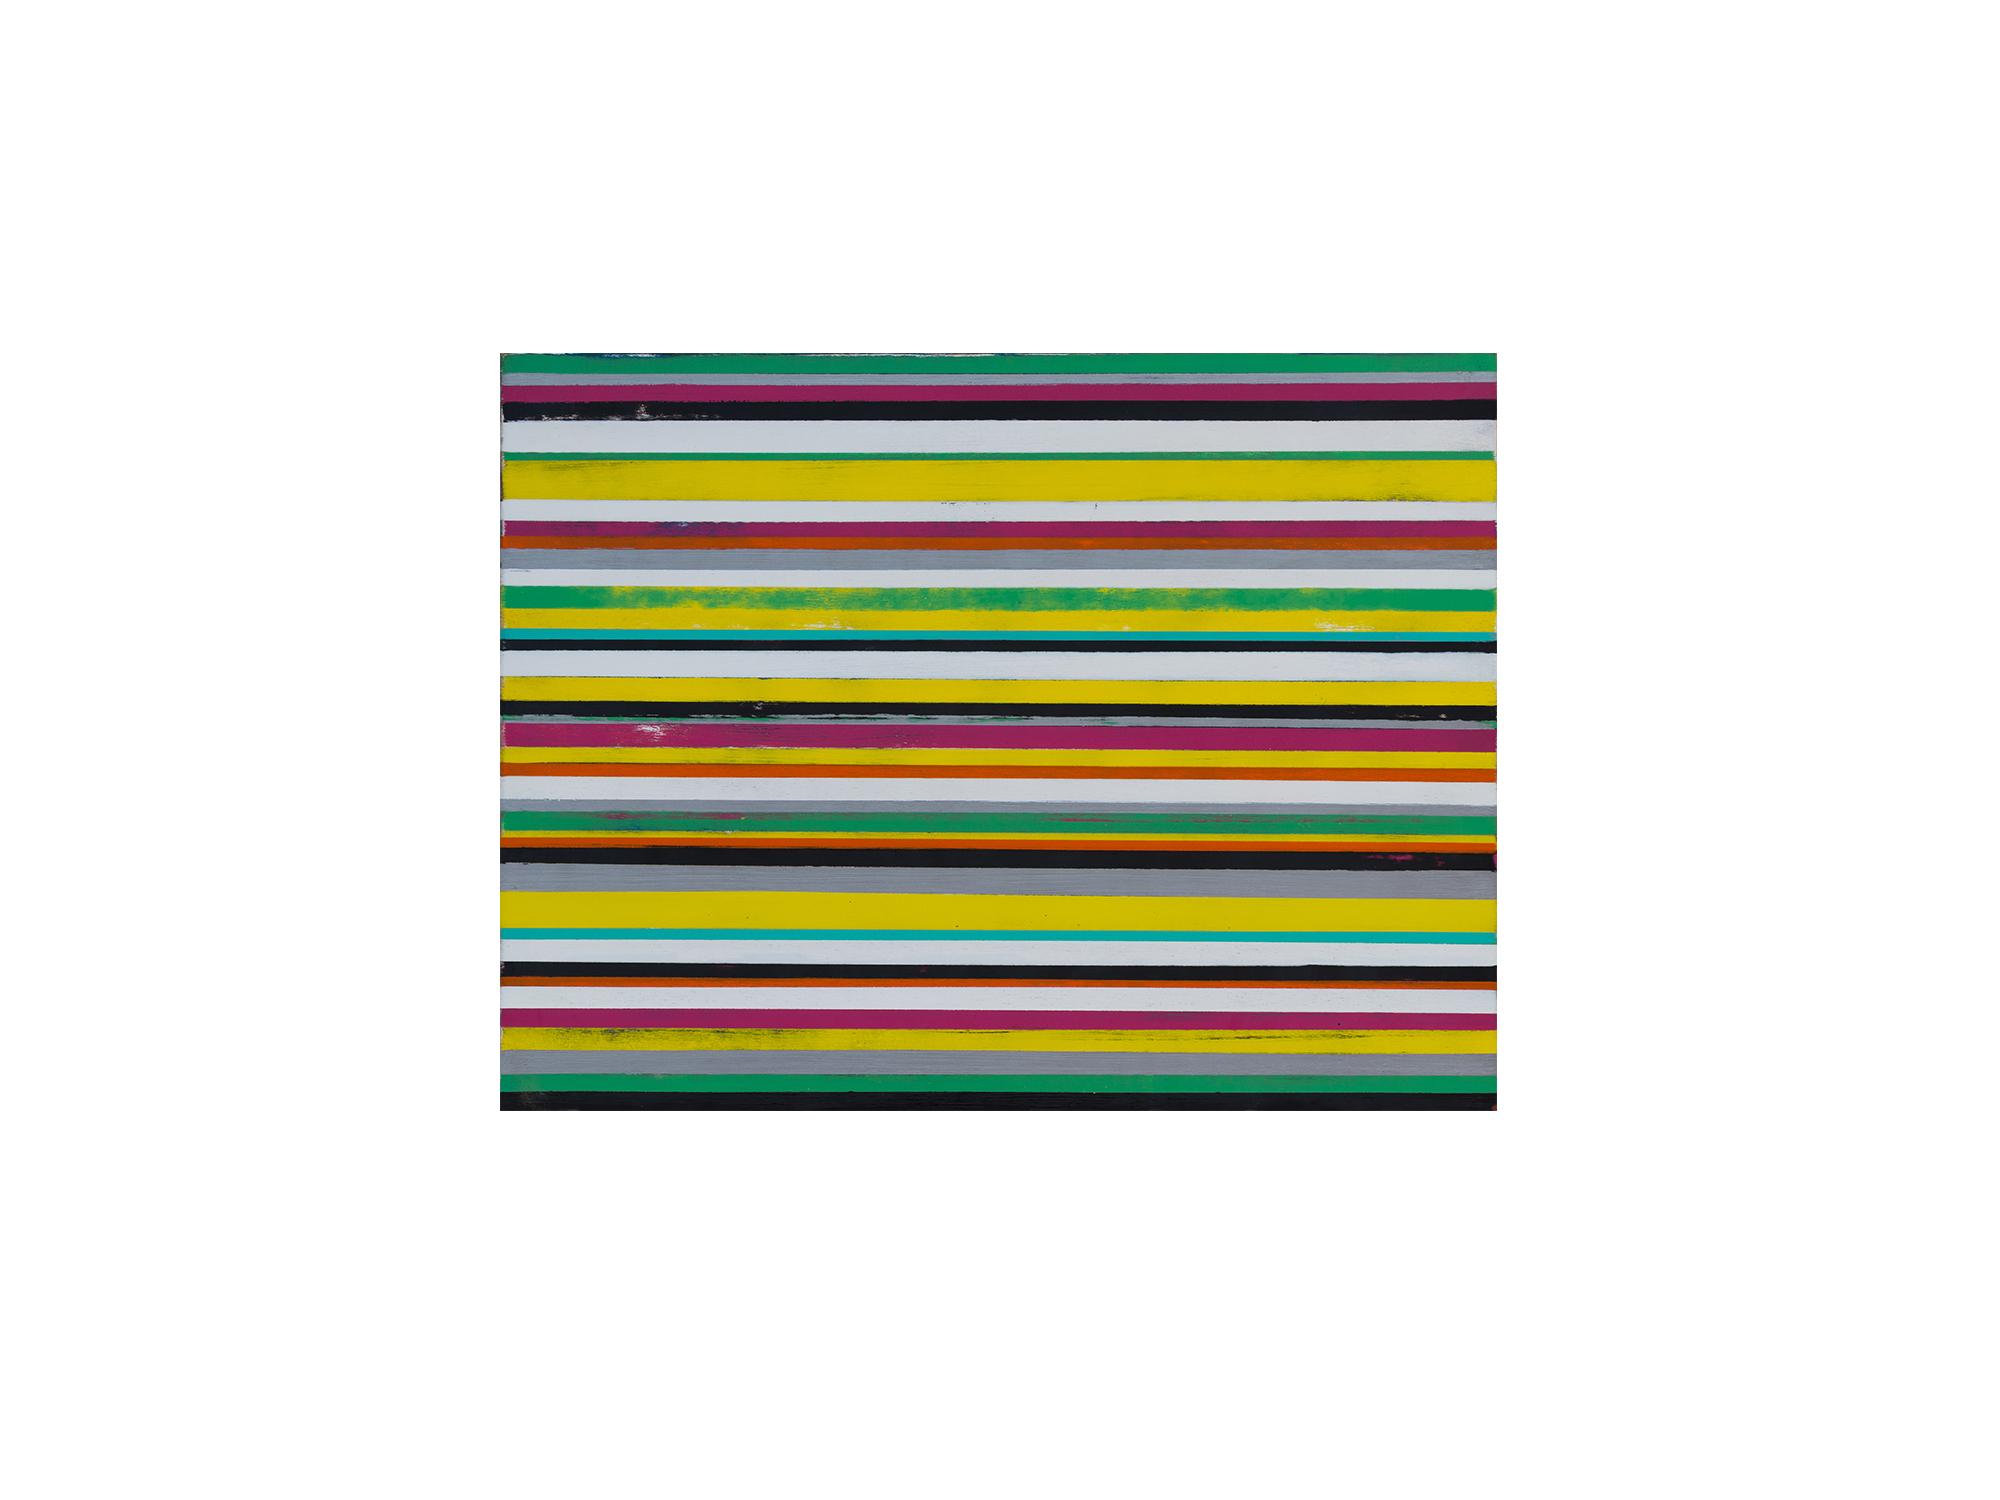 Brett McMahon   KL City 11 , 2017 acrylic and enamel on ply panel 60 x 80cm   ARTIST BIO